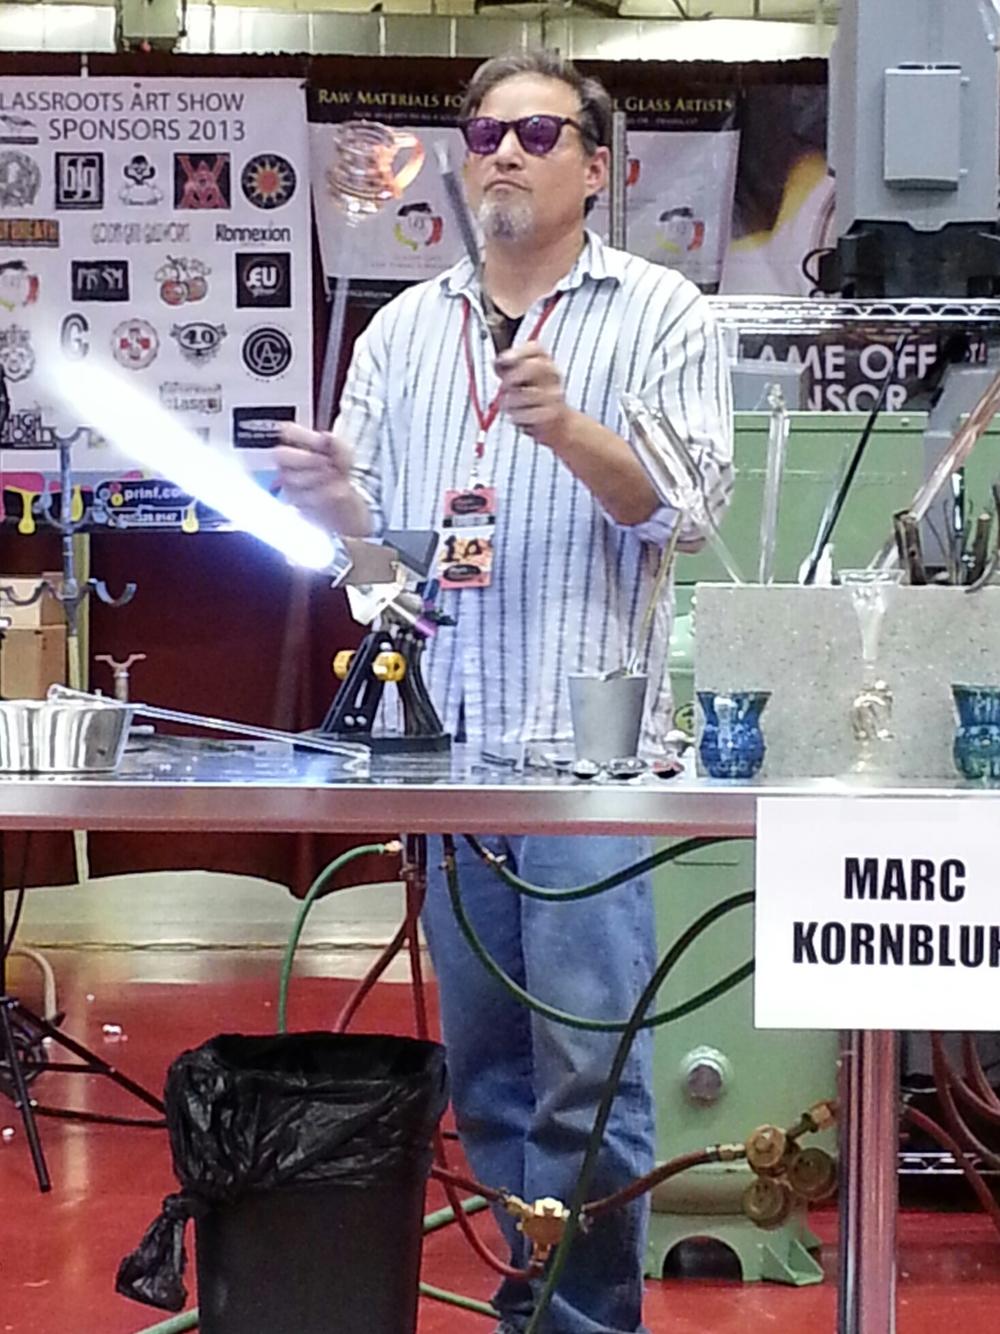 Marc demos @ Glassroots, Madison